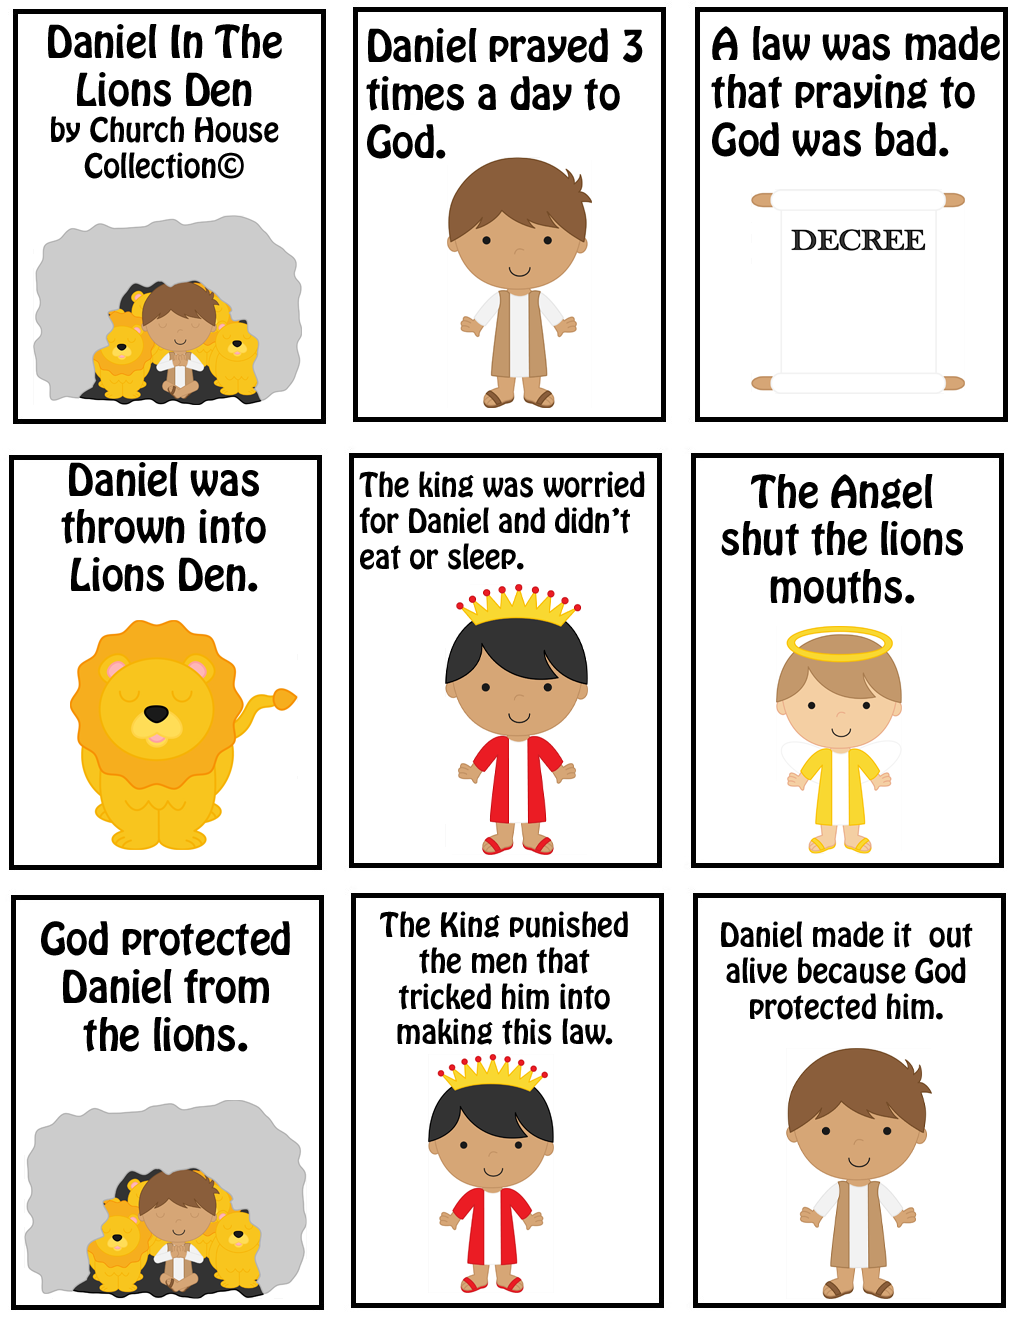 1000 images about bible daniel on pinterest the lion. Black Bedroom Furniture Sets. Home Design Ideas